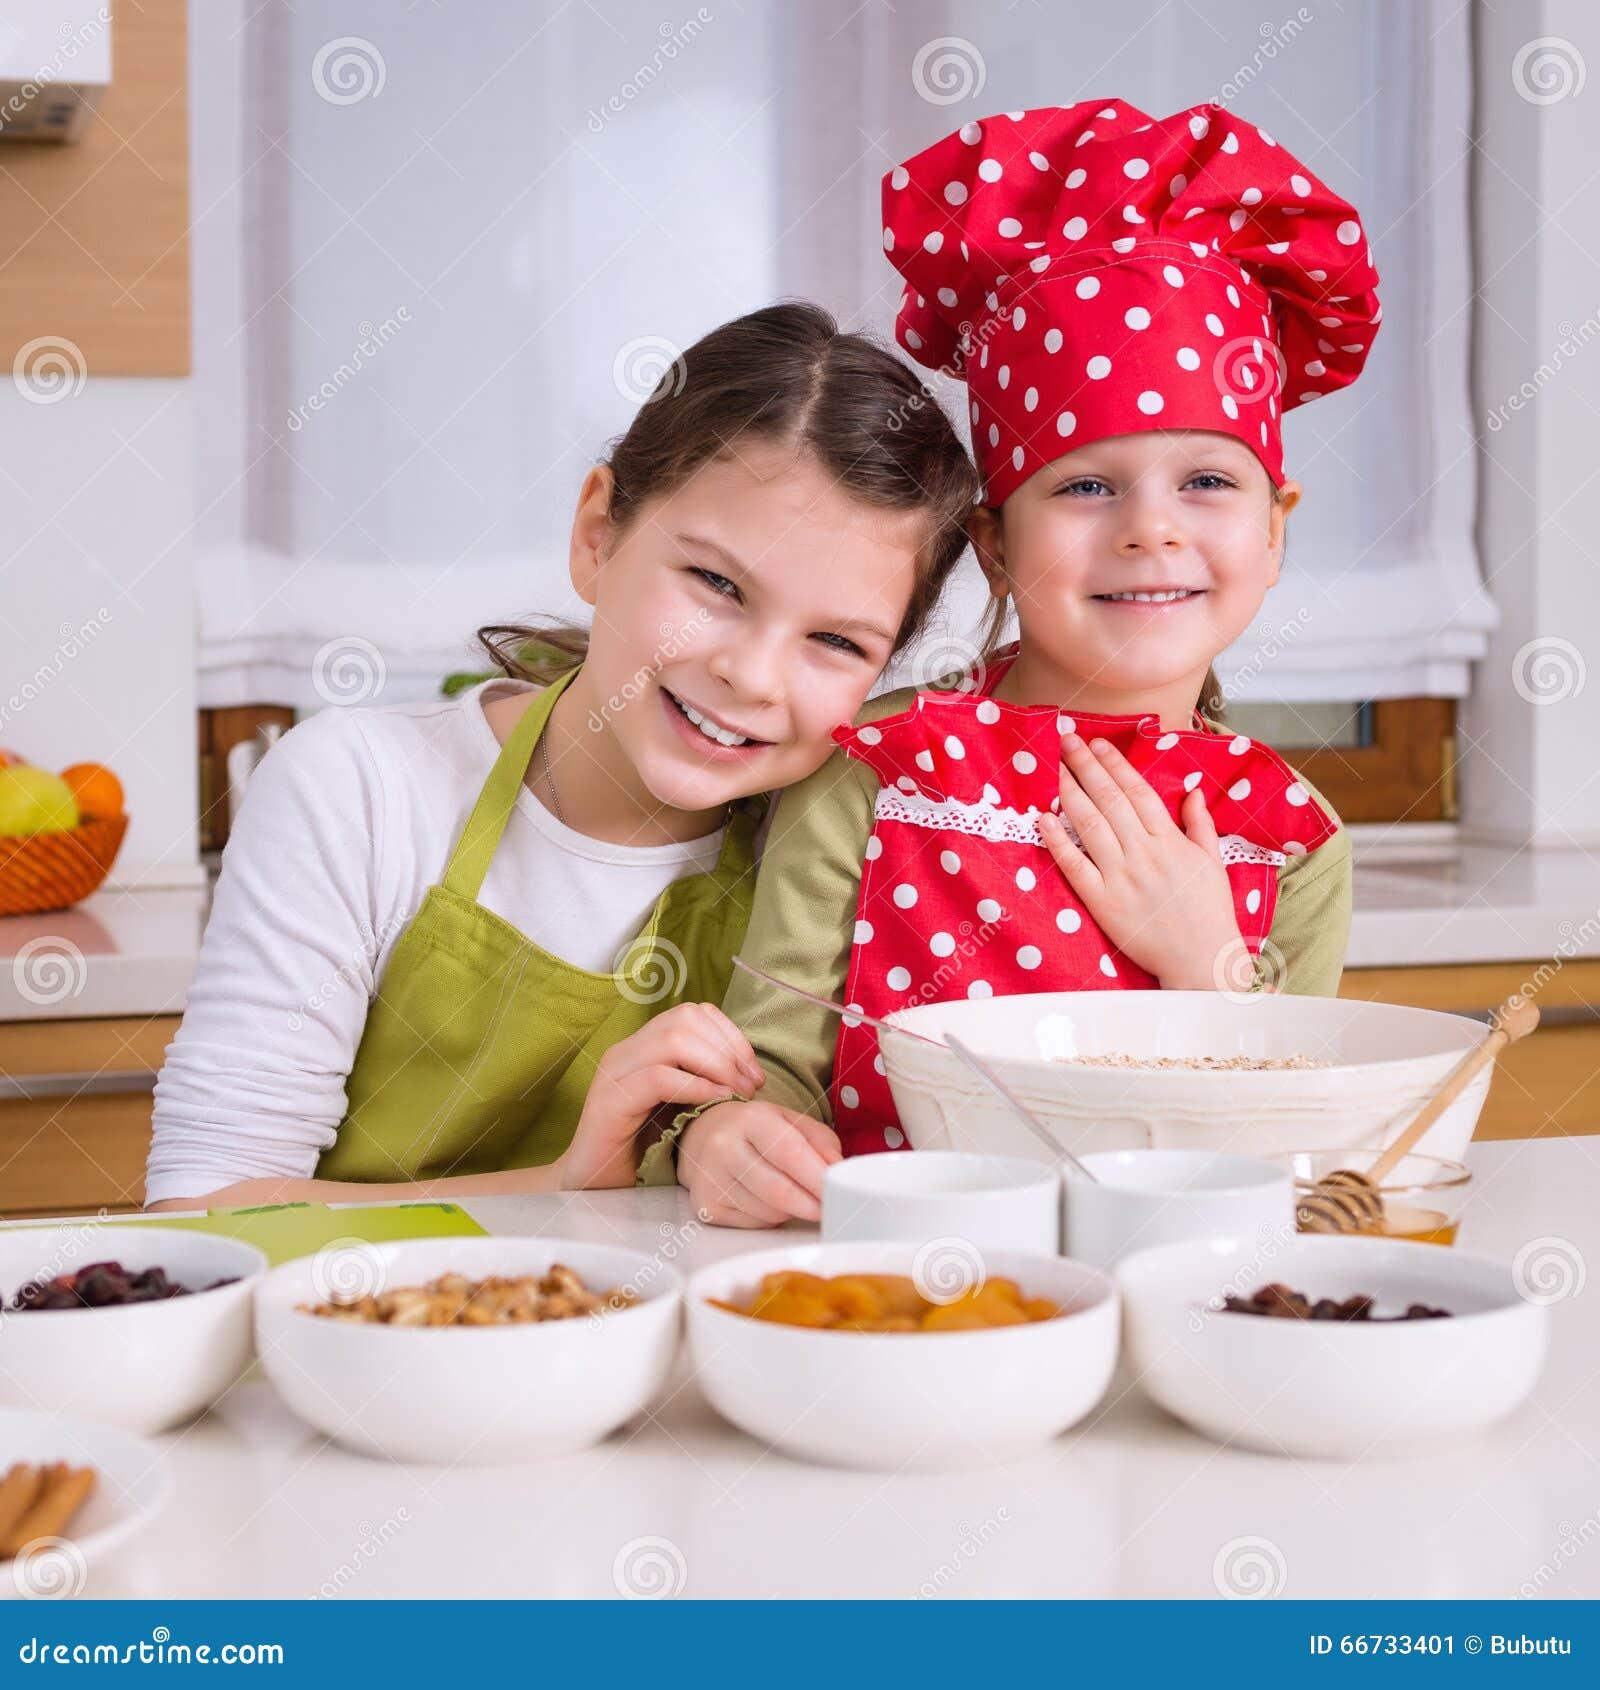 Happy Girl Kitchen: Girl Preparing Granola Stock Photo